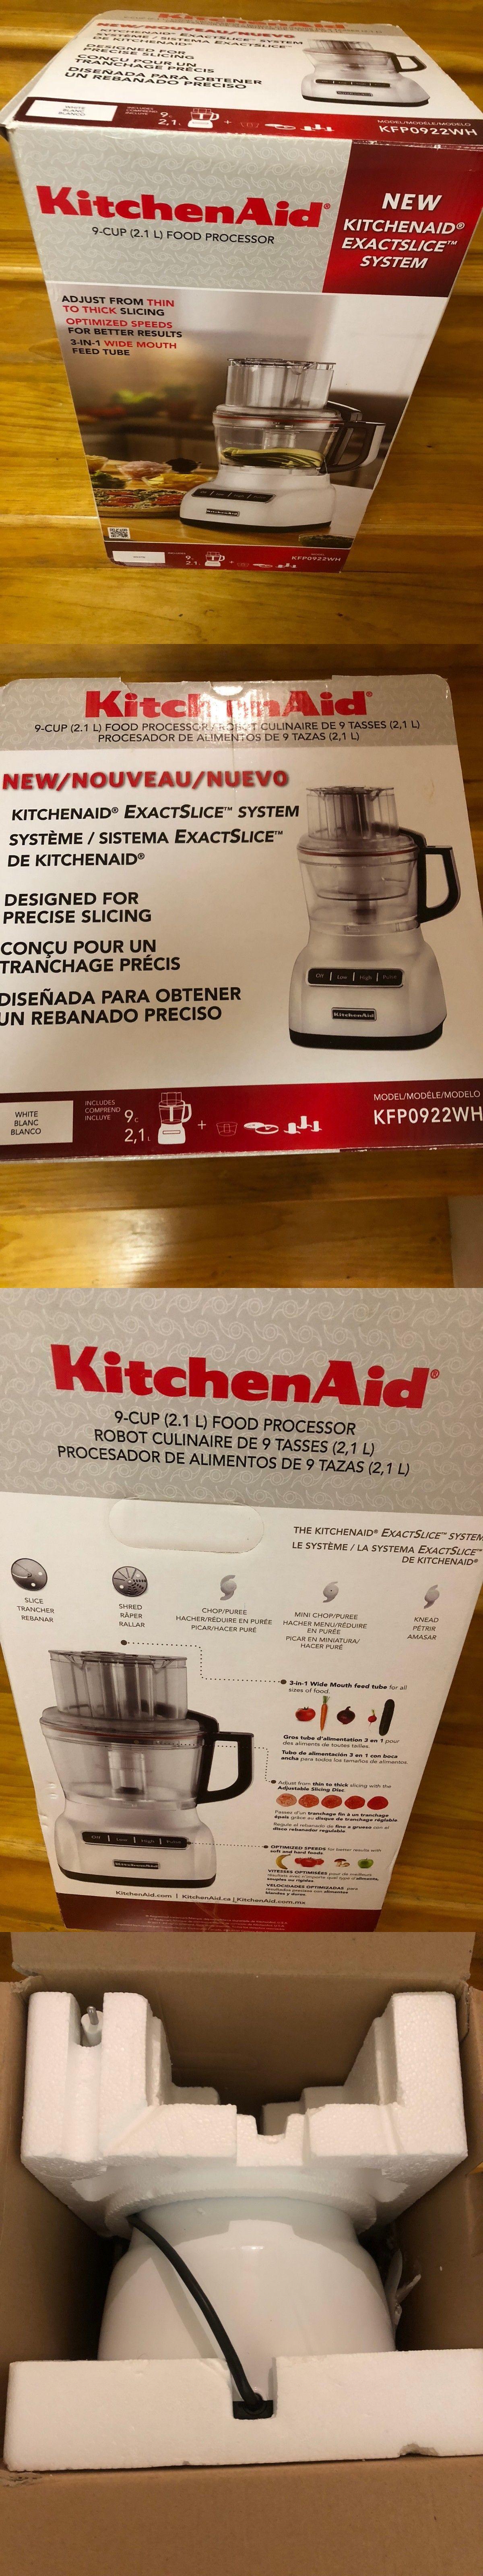 Food processors 20673 kitchenaid kfp0922wh 9cup food